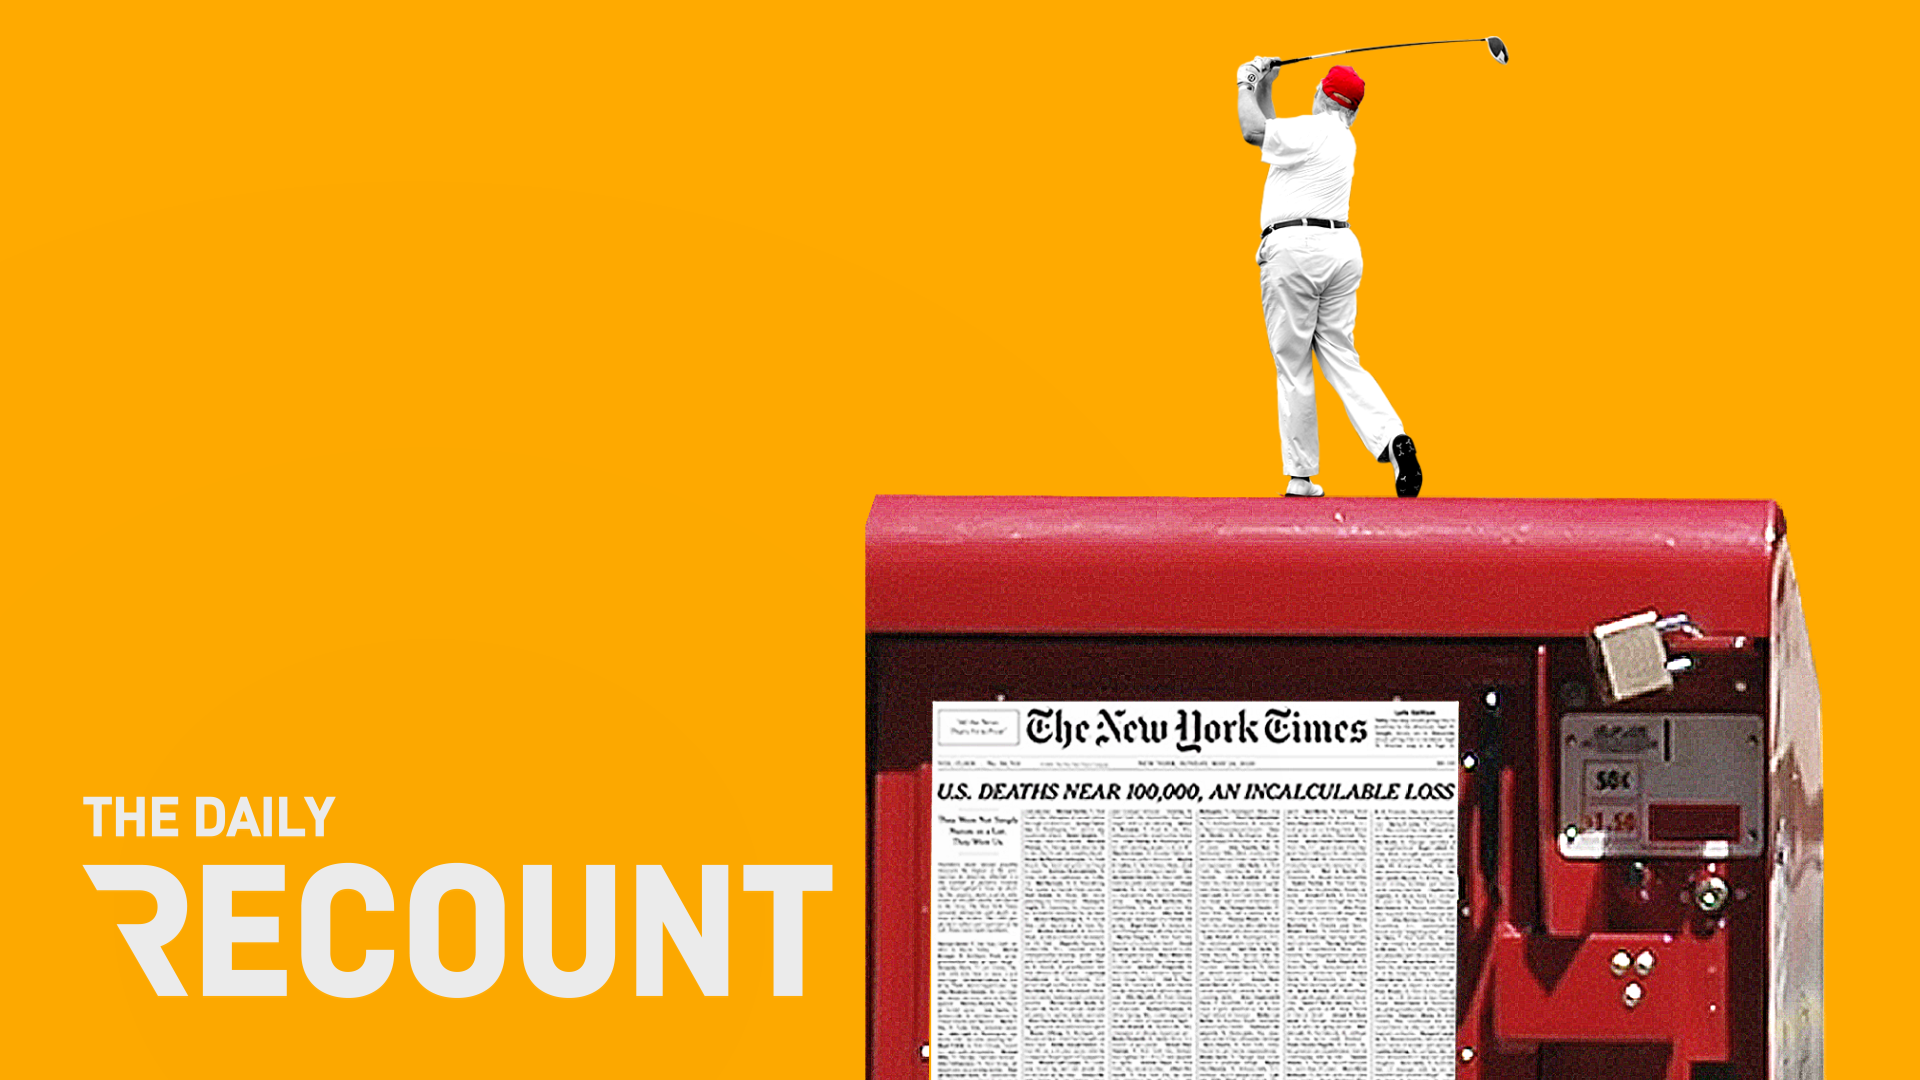 Trump Tweets and Golfs as Deaths Near 100,000